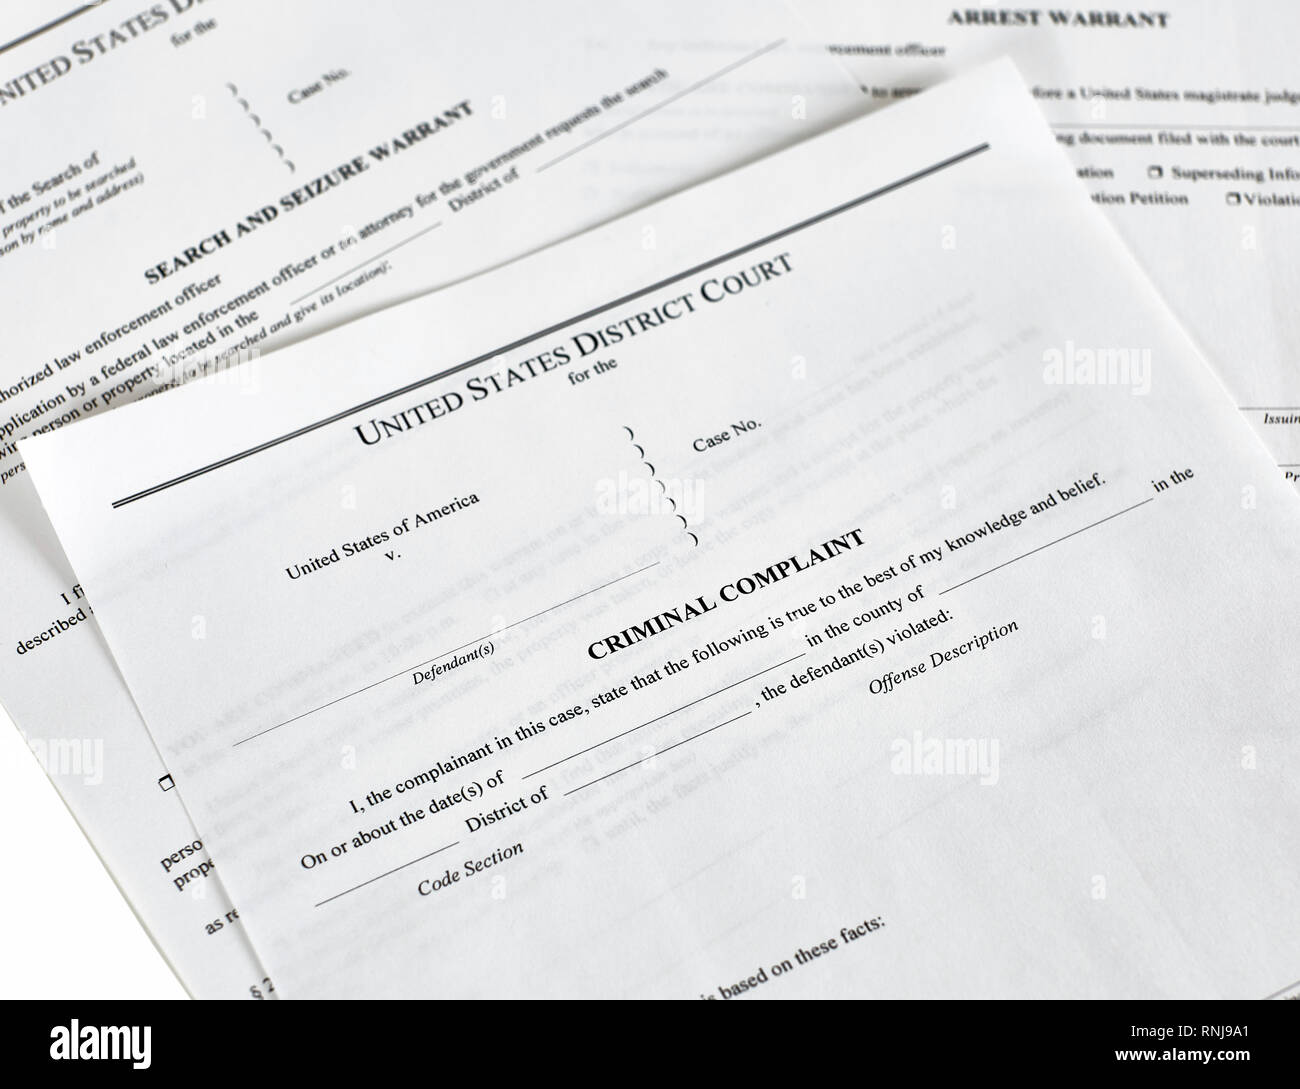 District Court criminal complaint, arrest warrant and search and